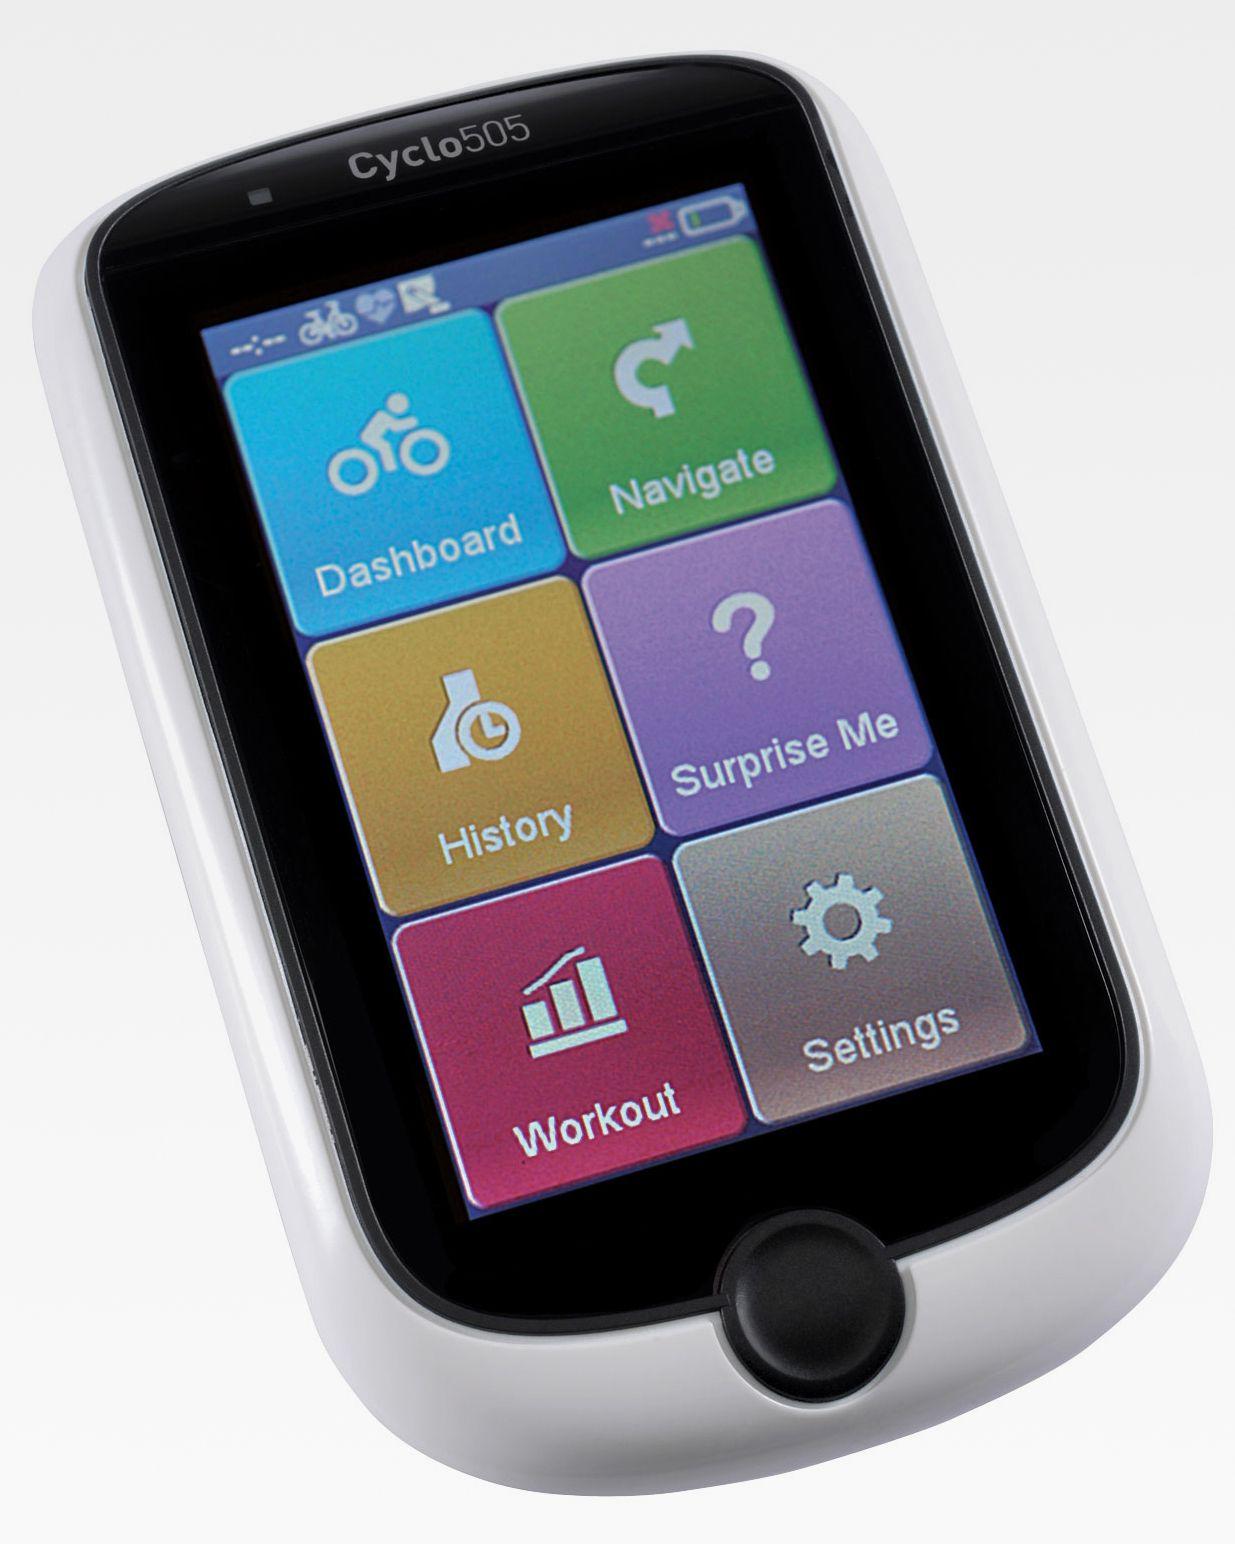 Magellan Cyclo 505HC GPS